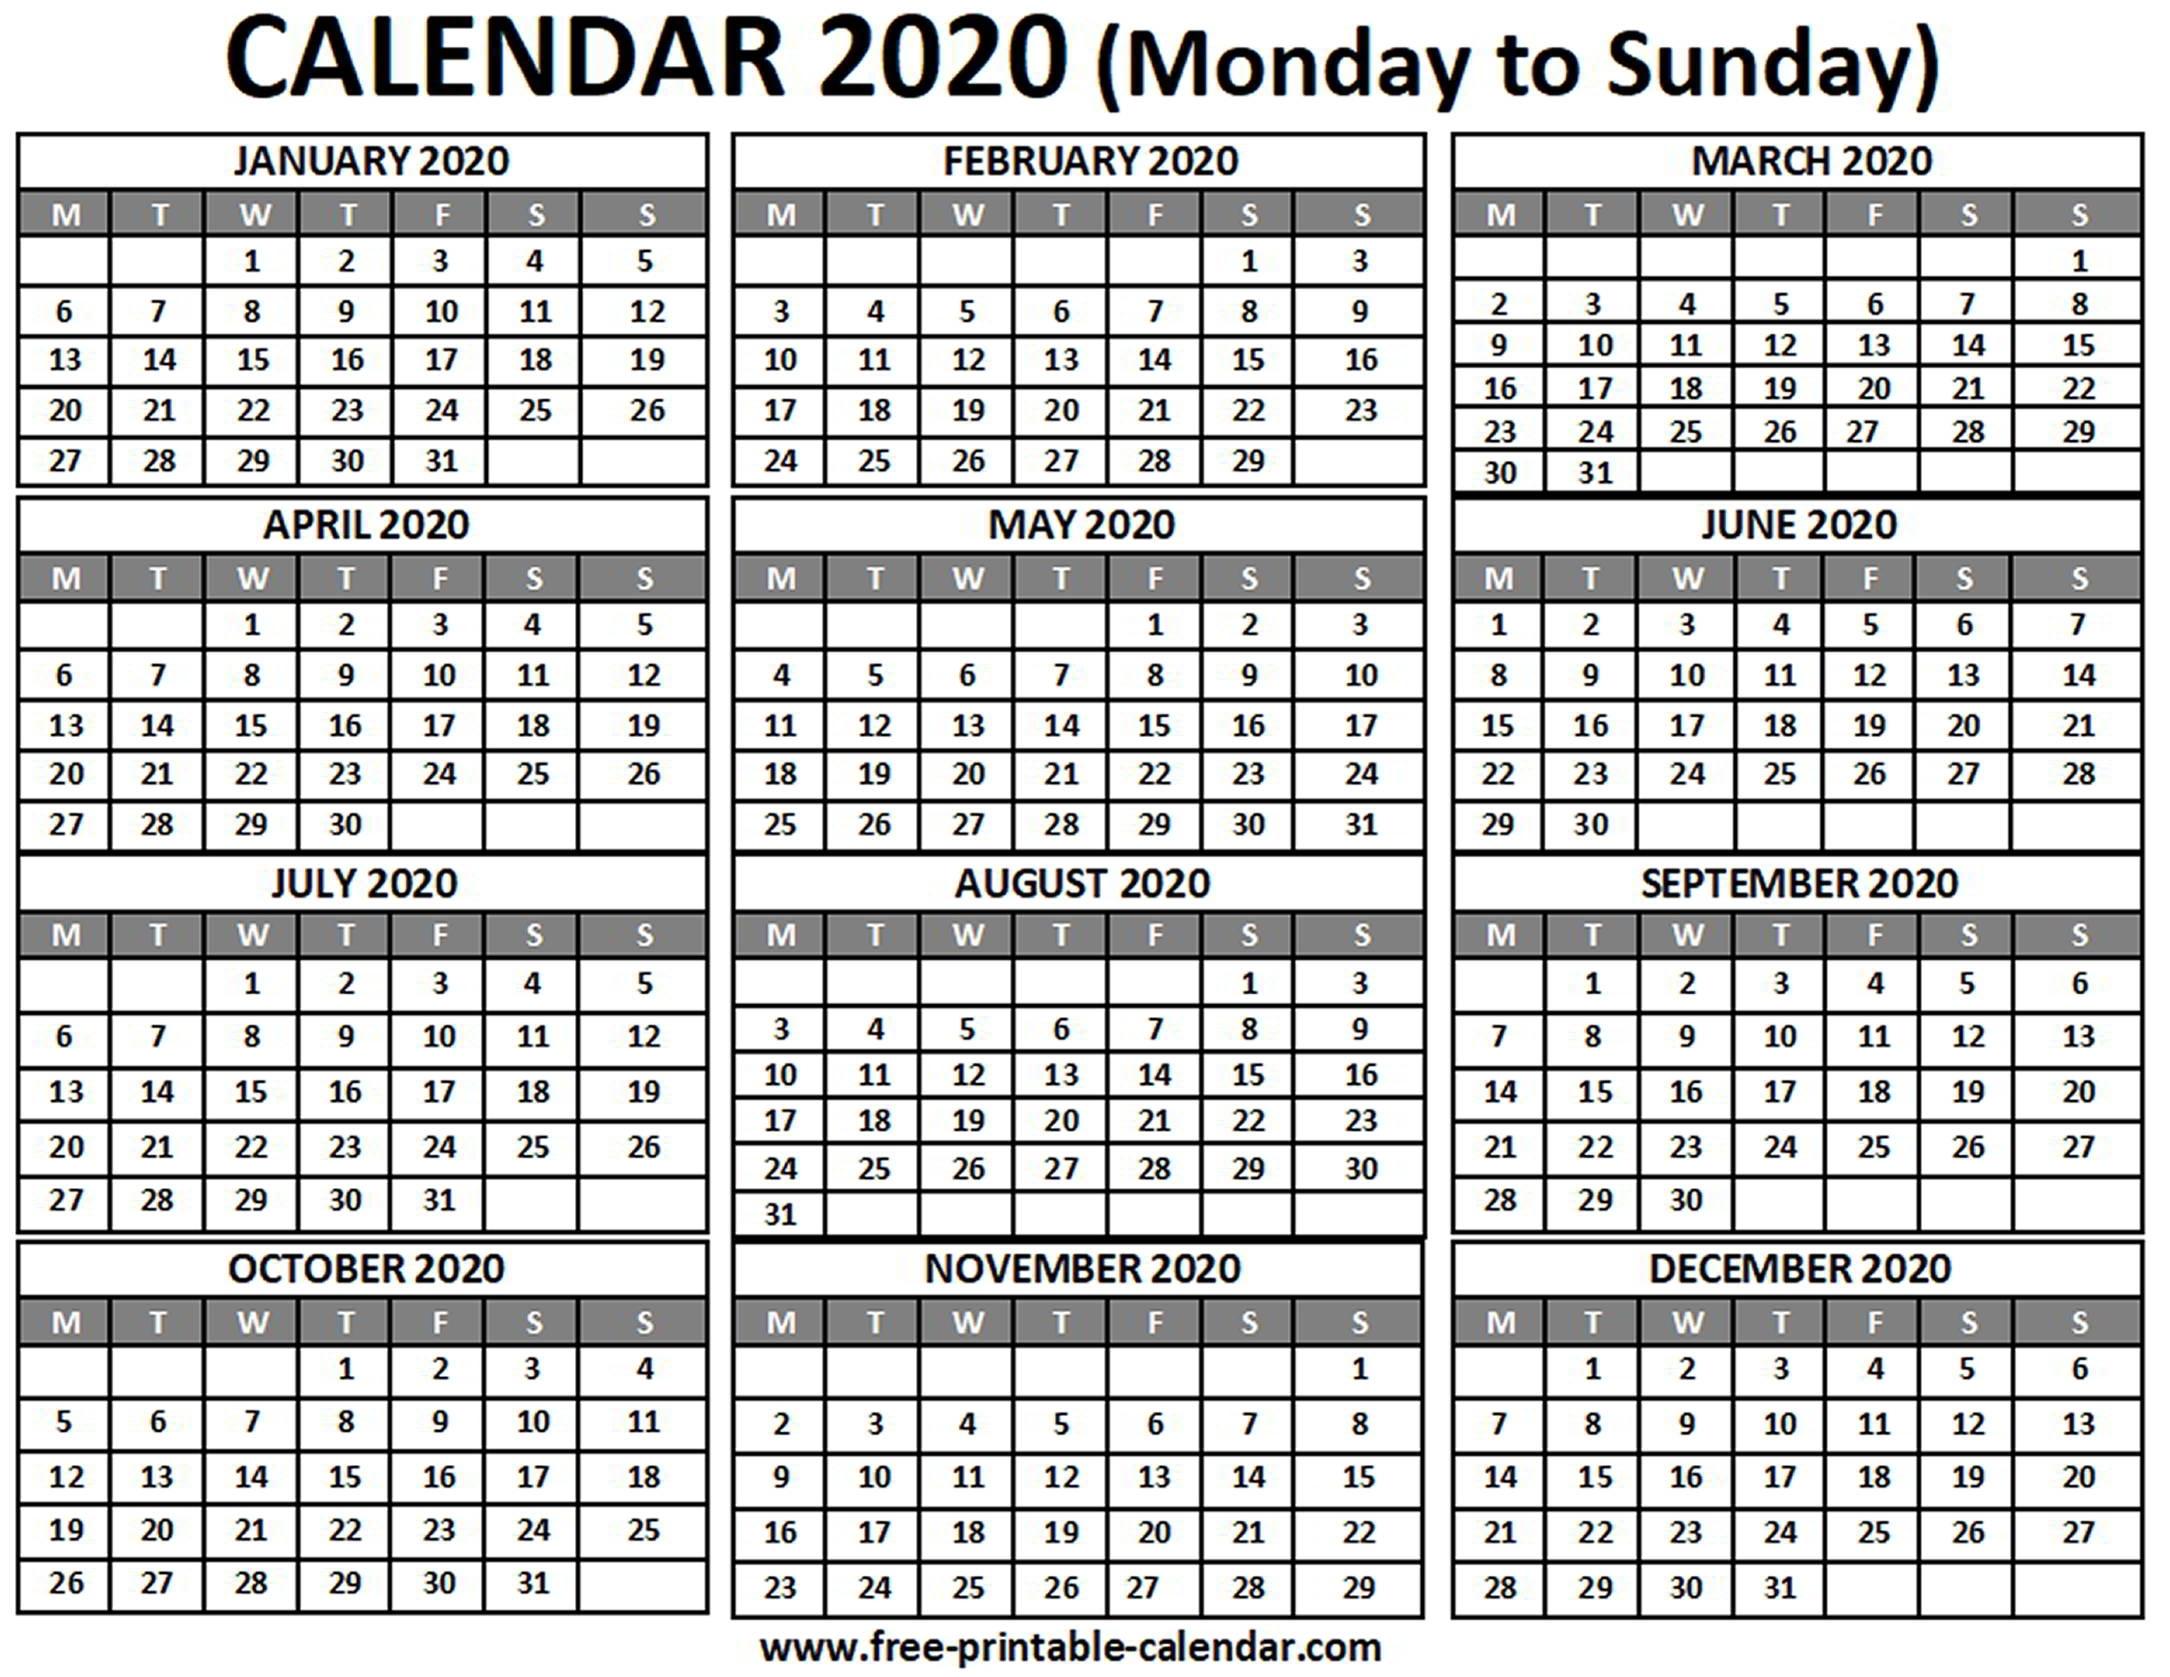 2020 Calendar - Free-Printable-Calendar throughout 2020 Printable Calendar Starting With Monday